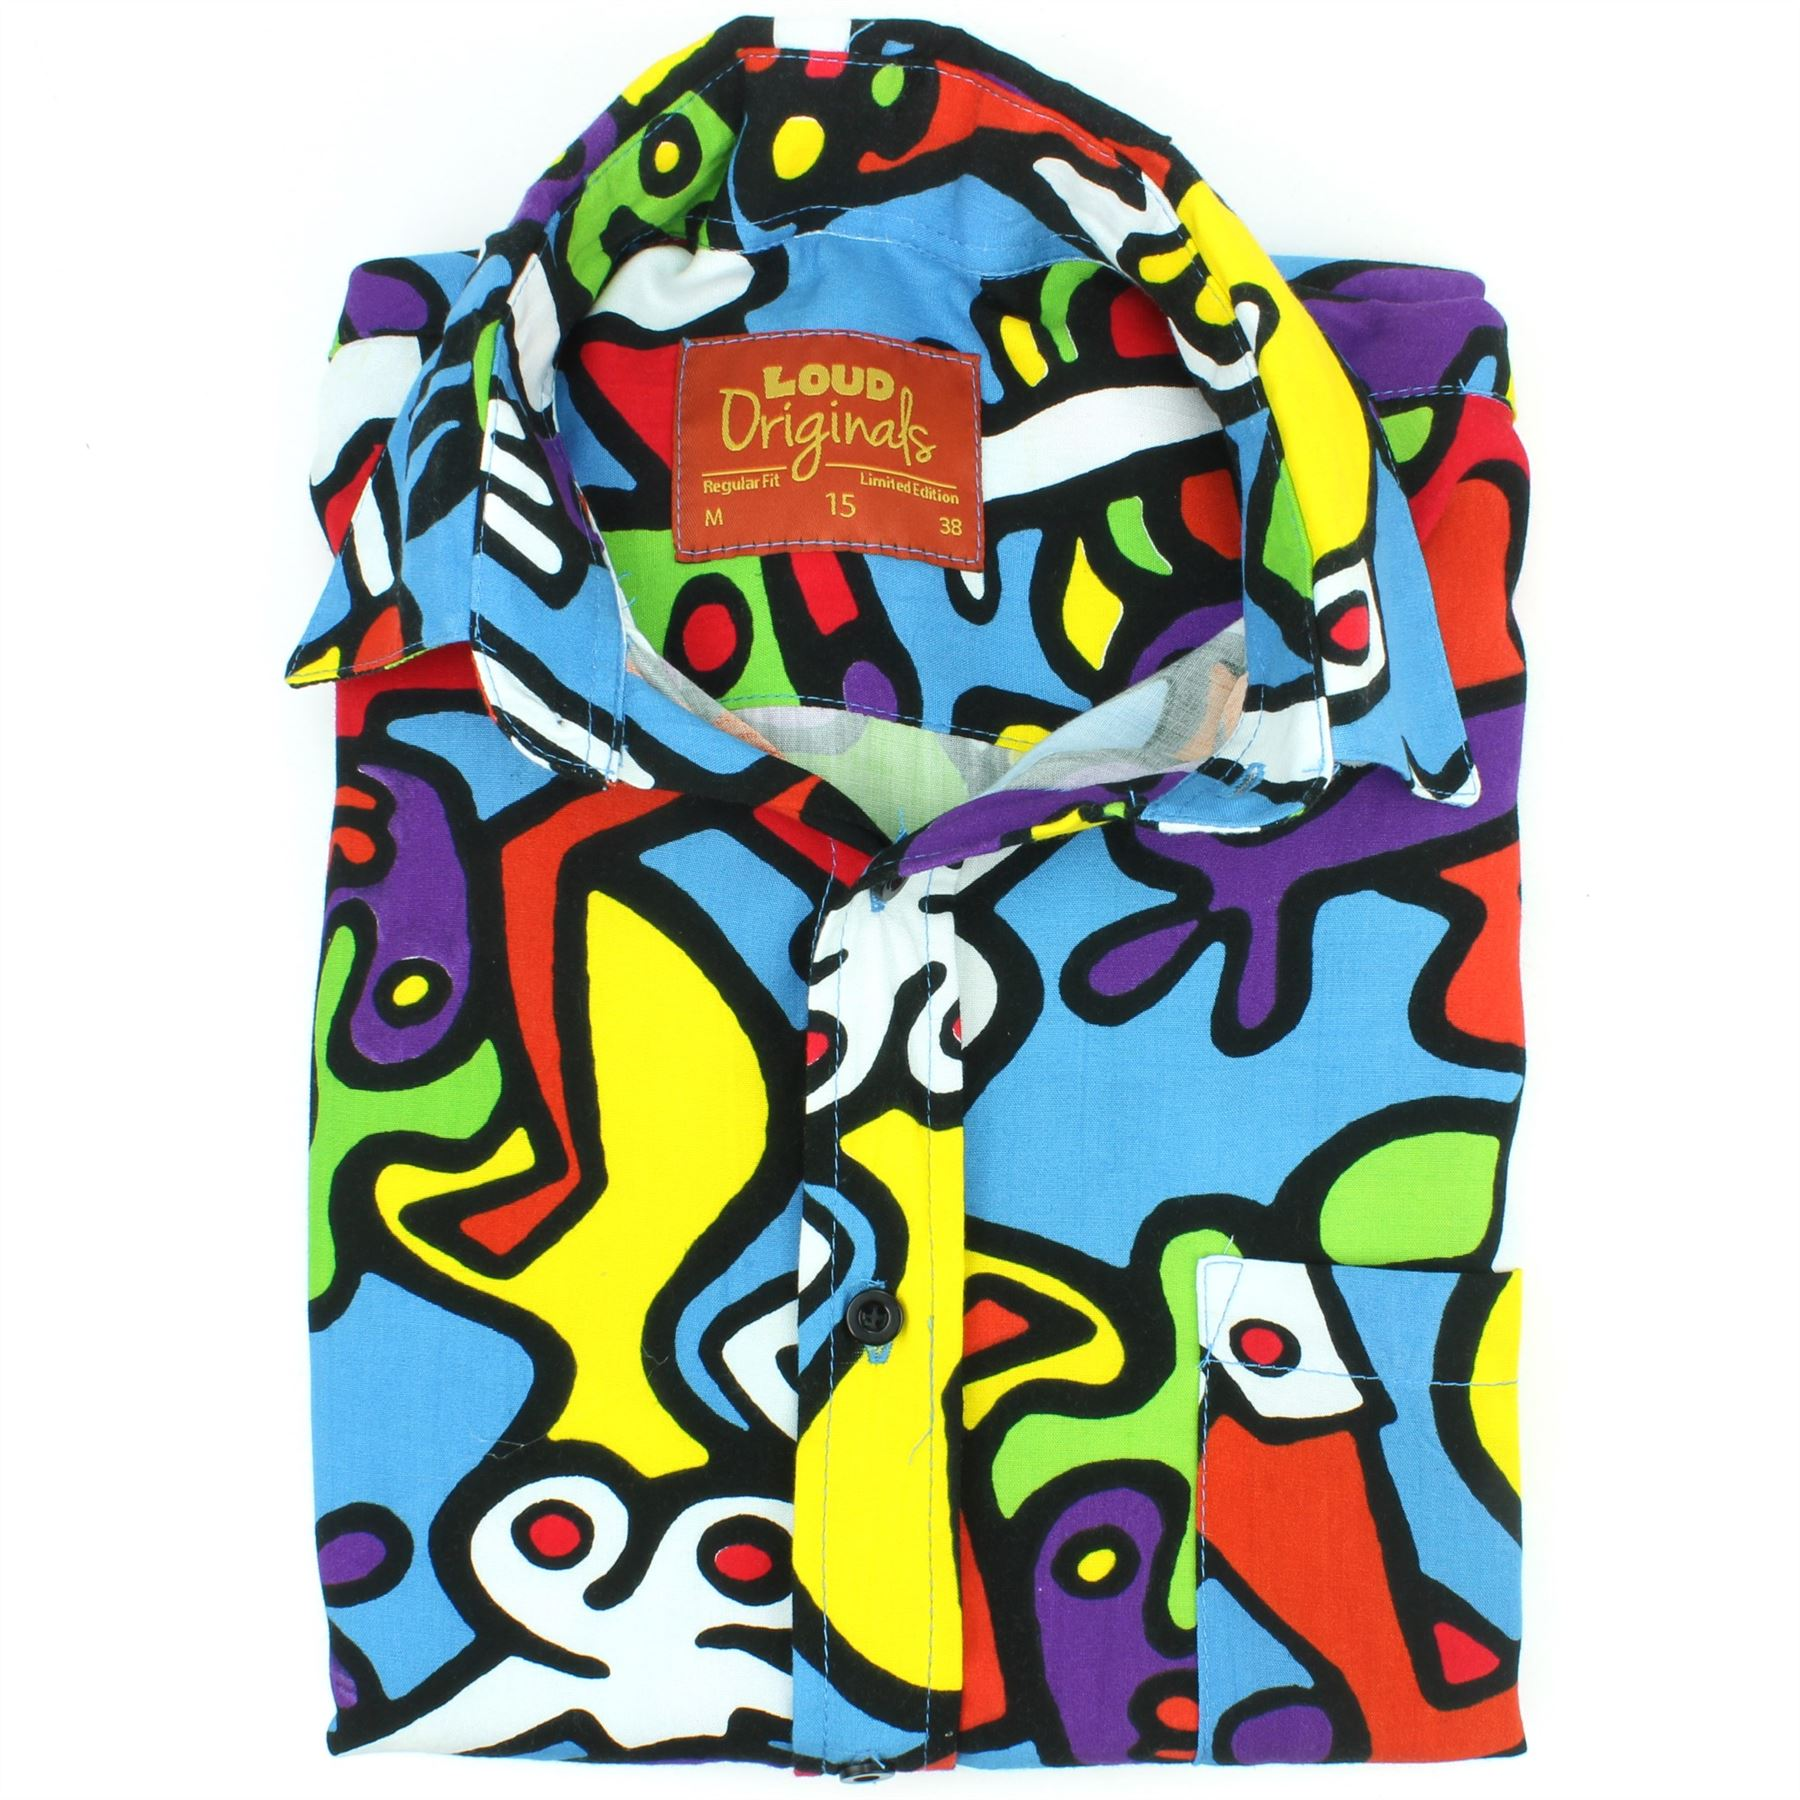 Mens-Shirt-Loud-Originals-Rayon-REGULAR-FIT-Long-Sleeve-TIFFY-PRINT-Retro-Dance thumbnail 4